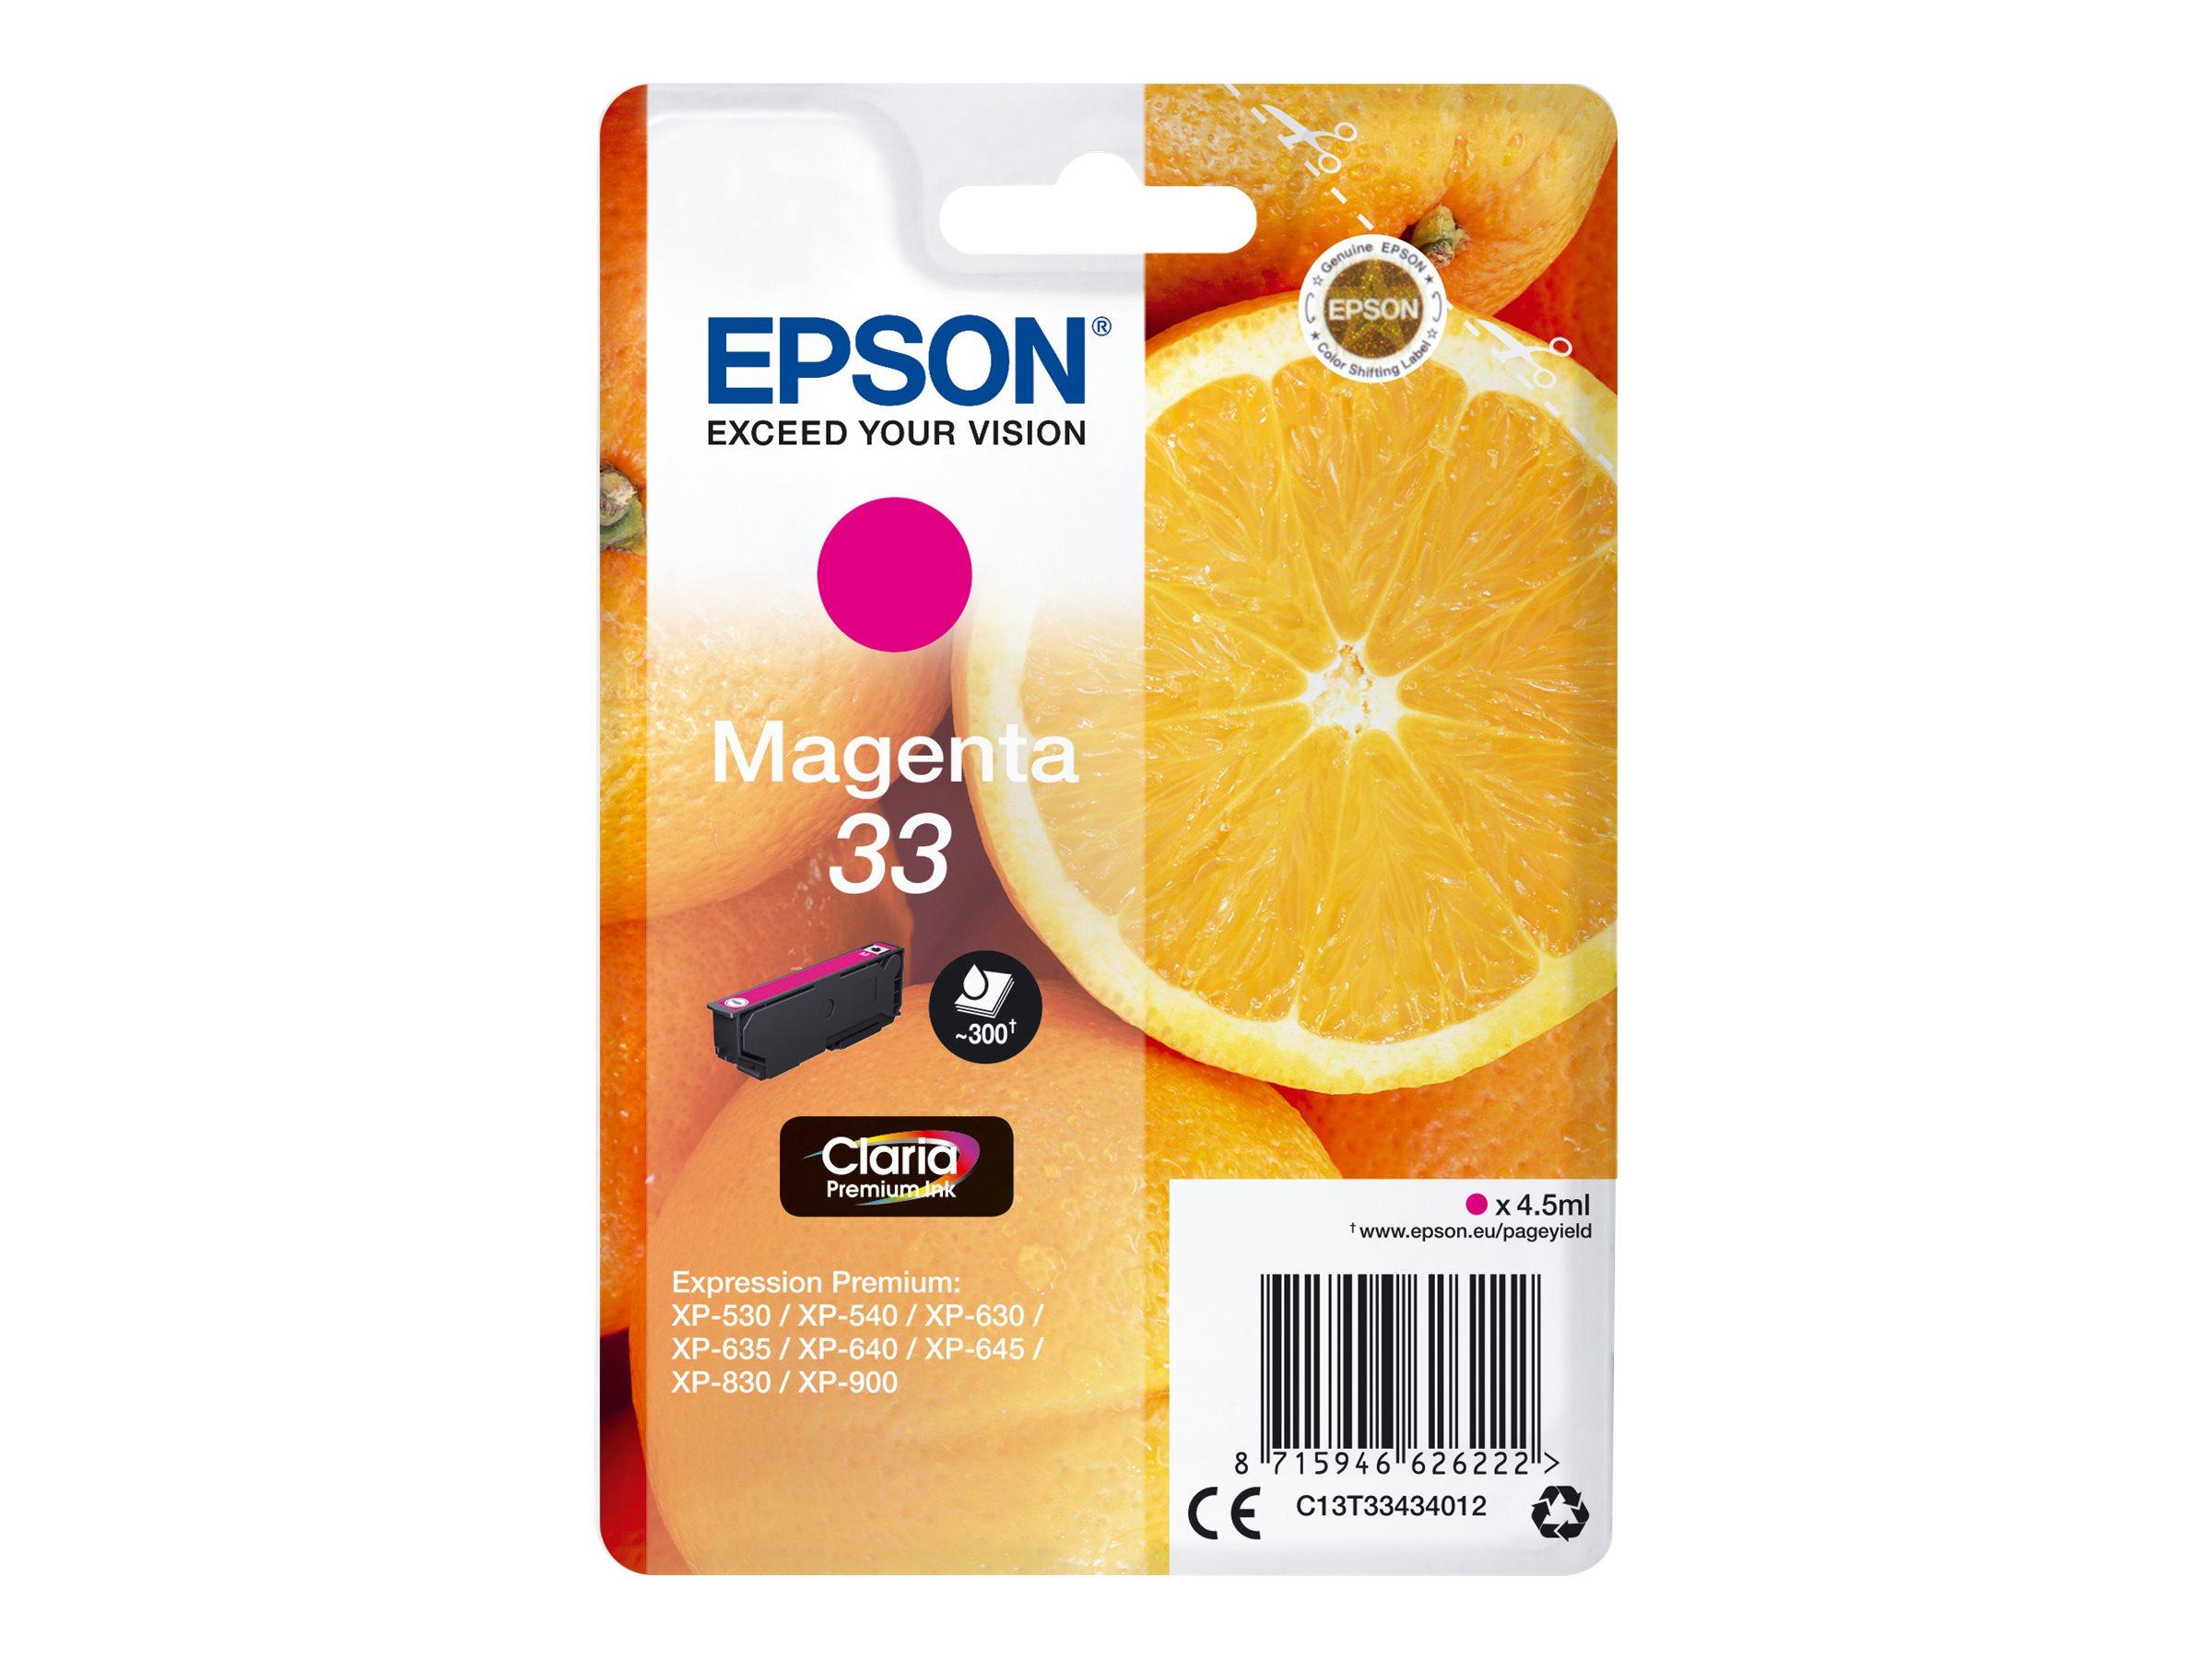 Epson T33 - oranges - magenta - originale - cartouche d'encre